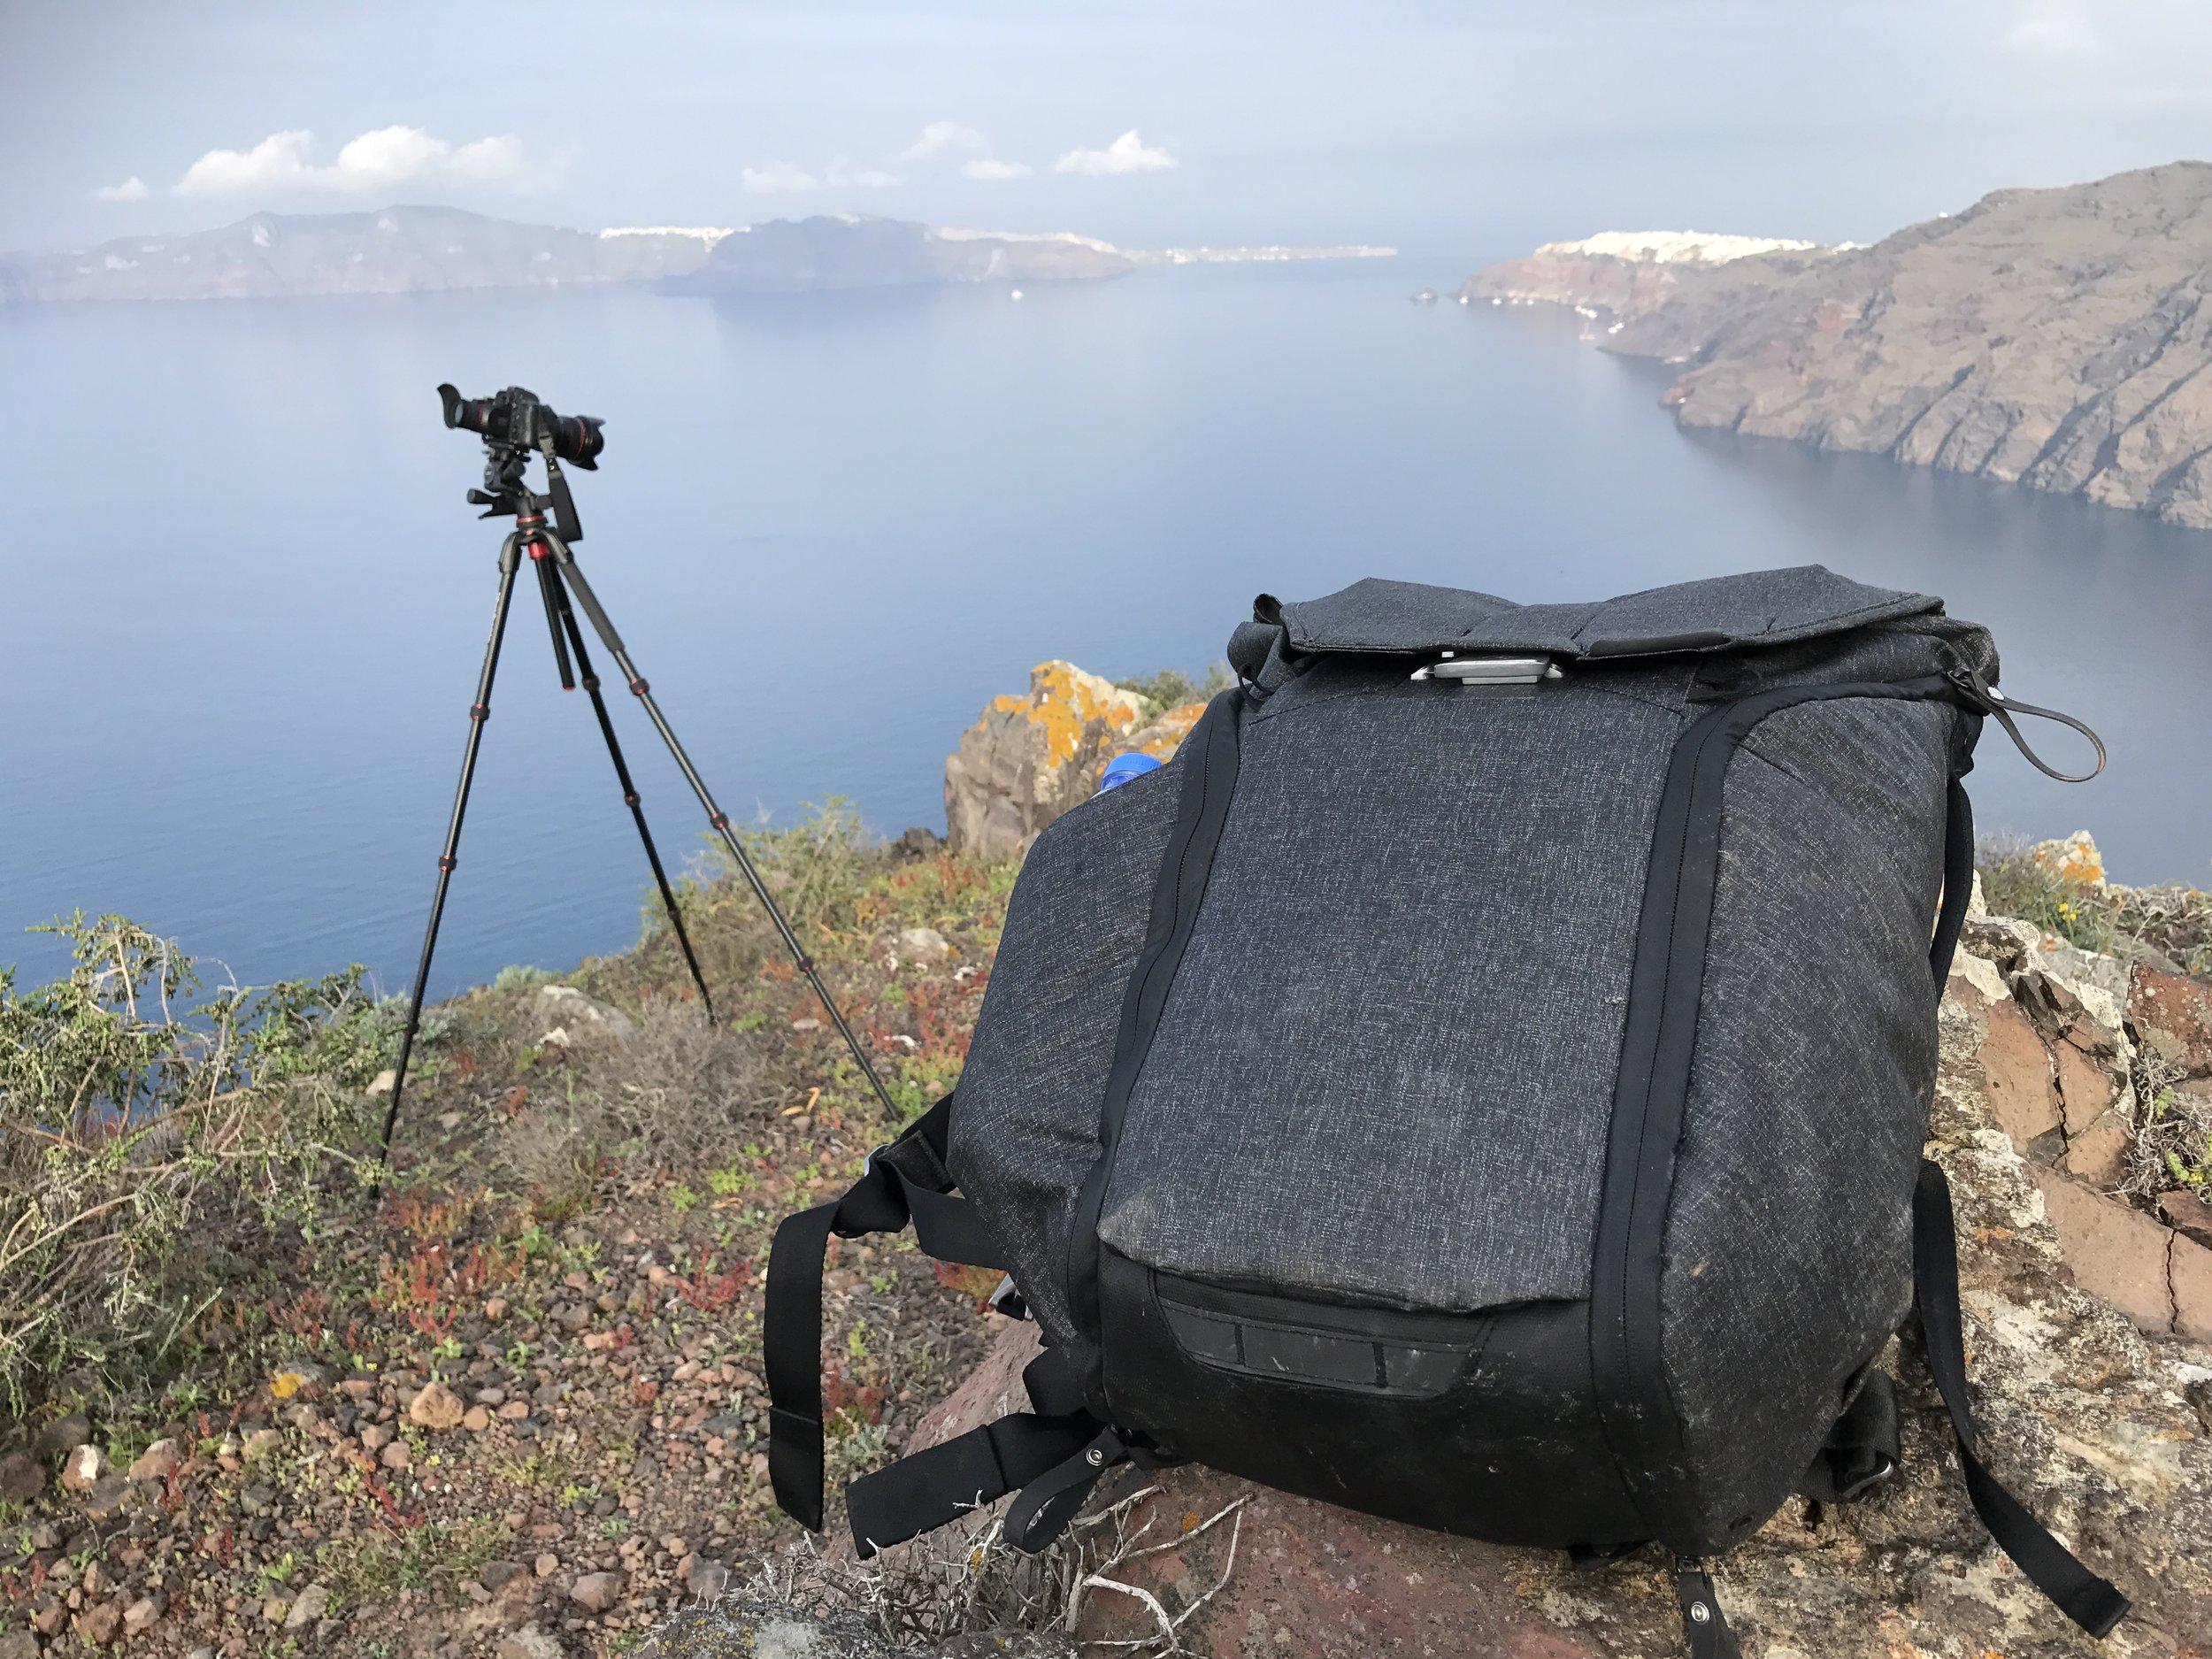 Peak Design Everyday Backpack on location in Santorini